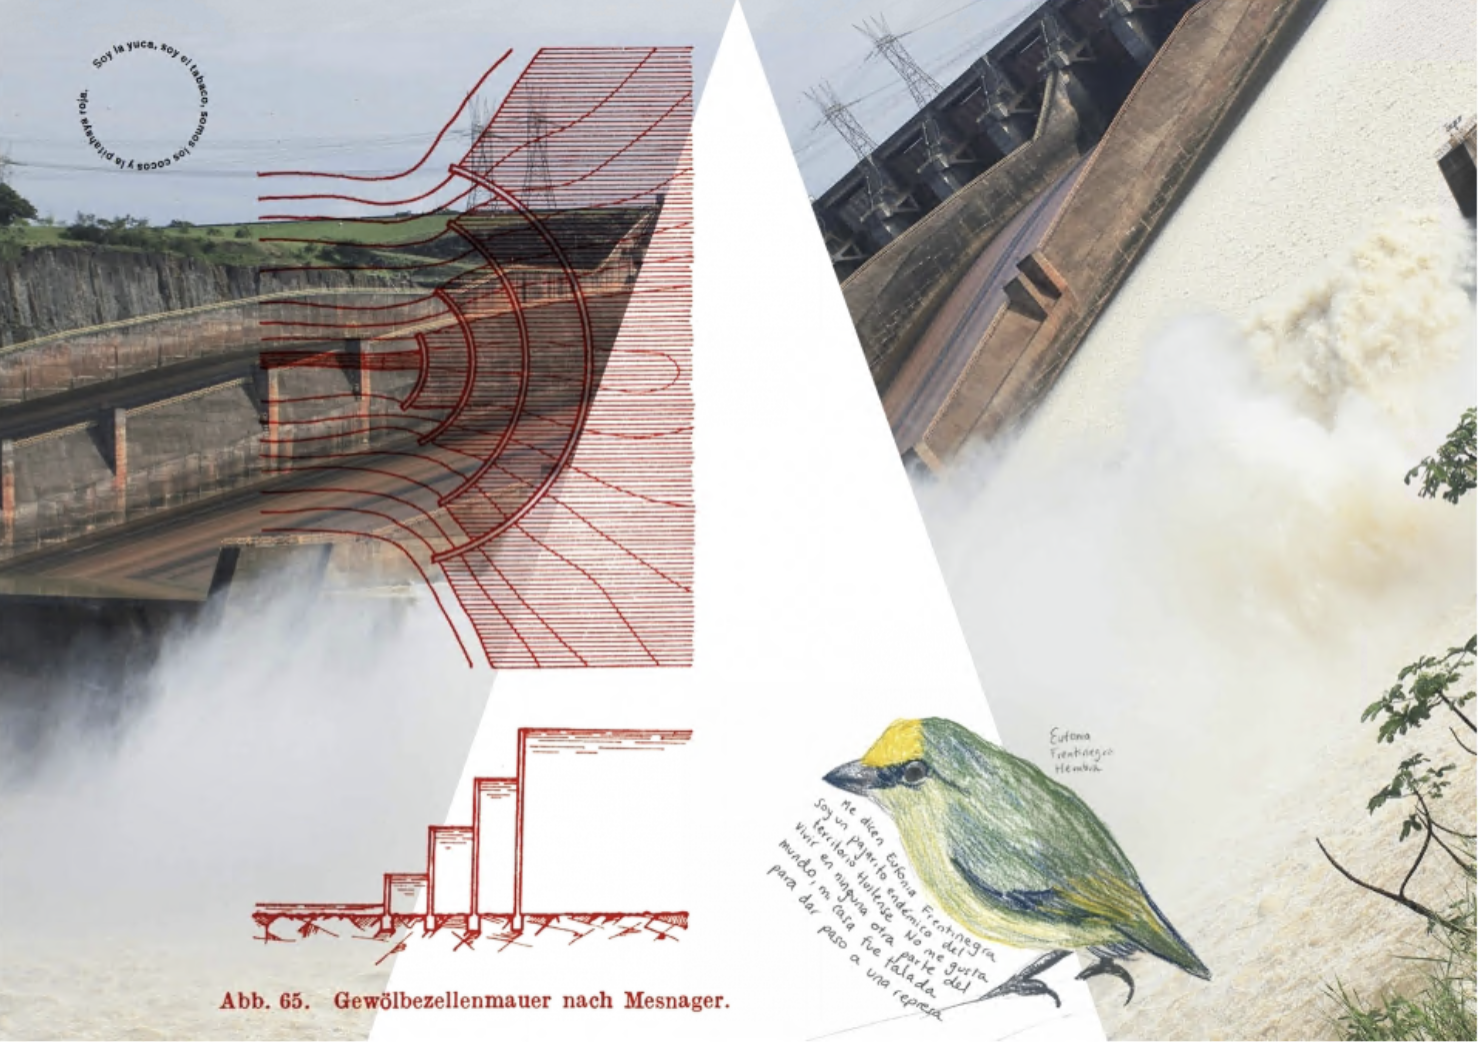 Carolina Caycedo 'Serpent River Book' (detail) 2017